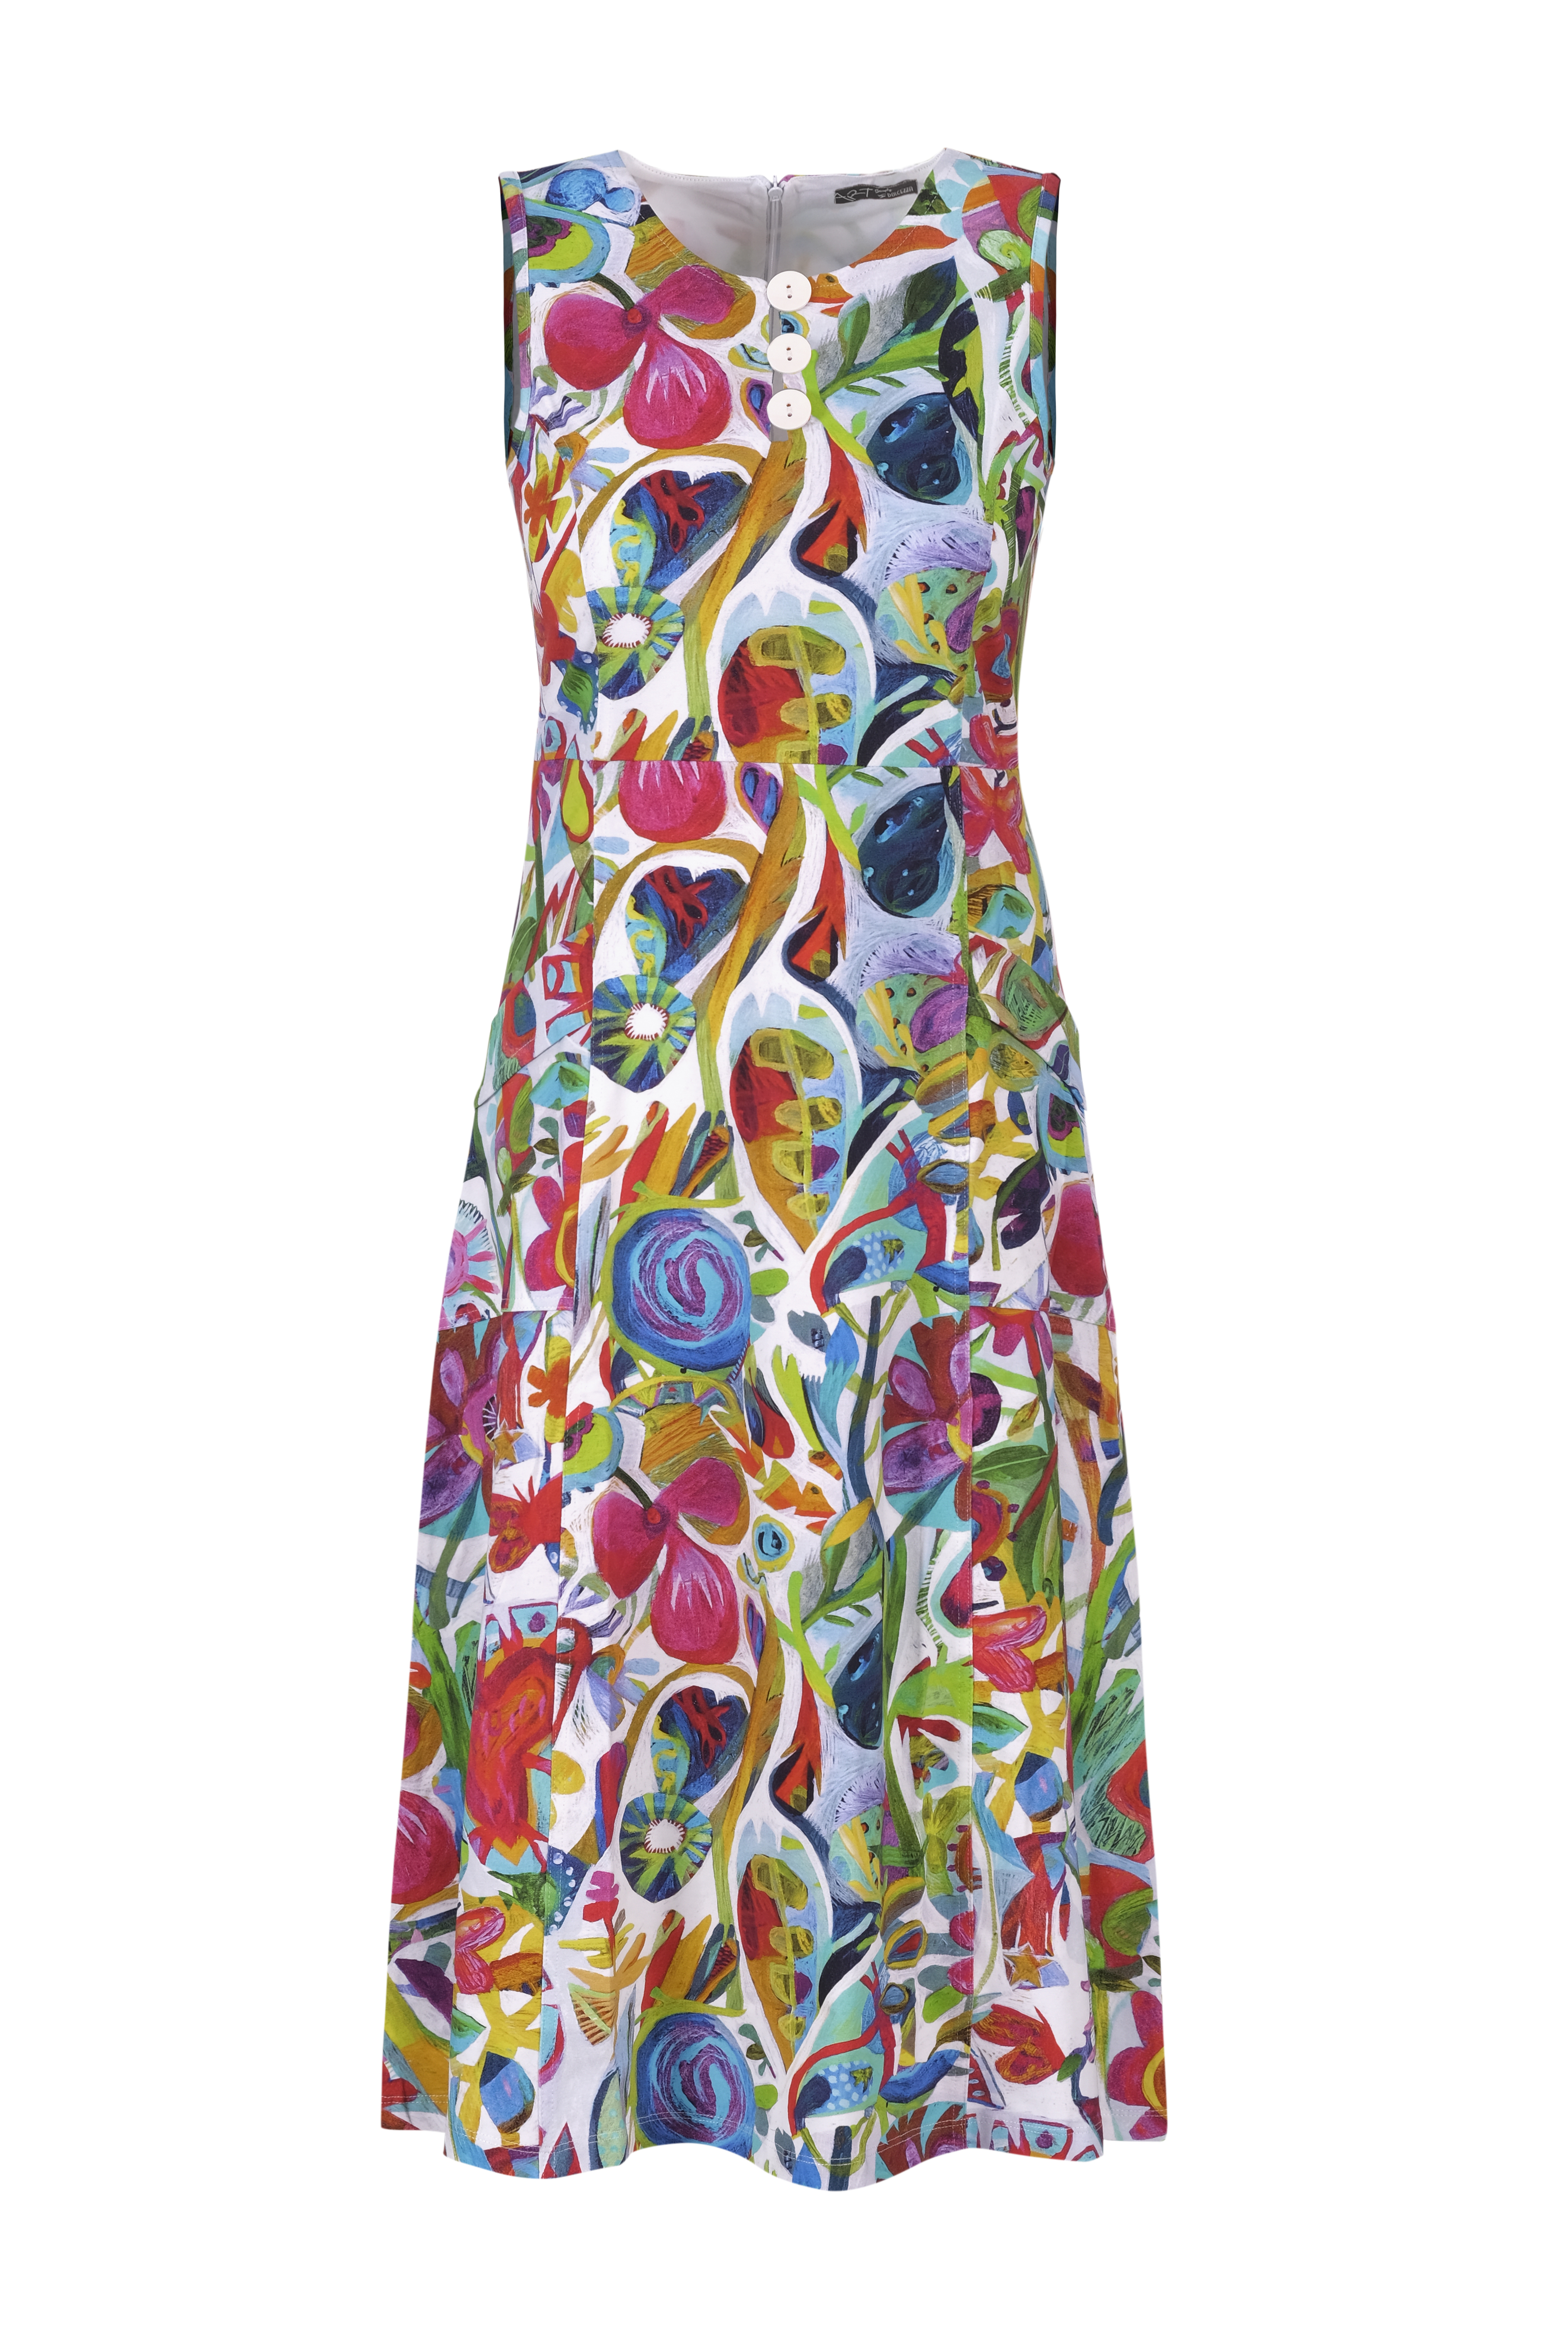 Simply Art Dolcezza: Flower Heart Abstract Art Midi Dress (1 Left!)